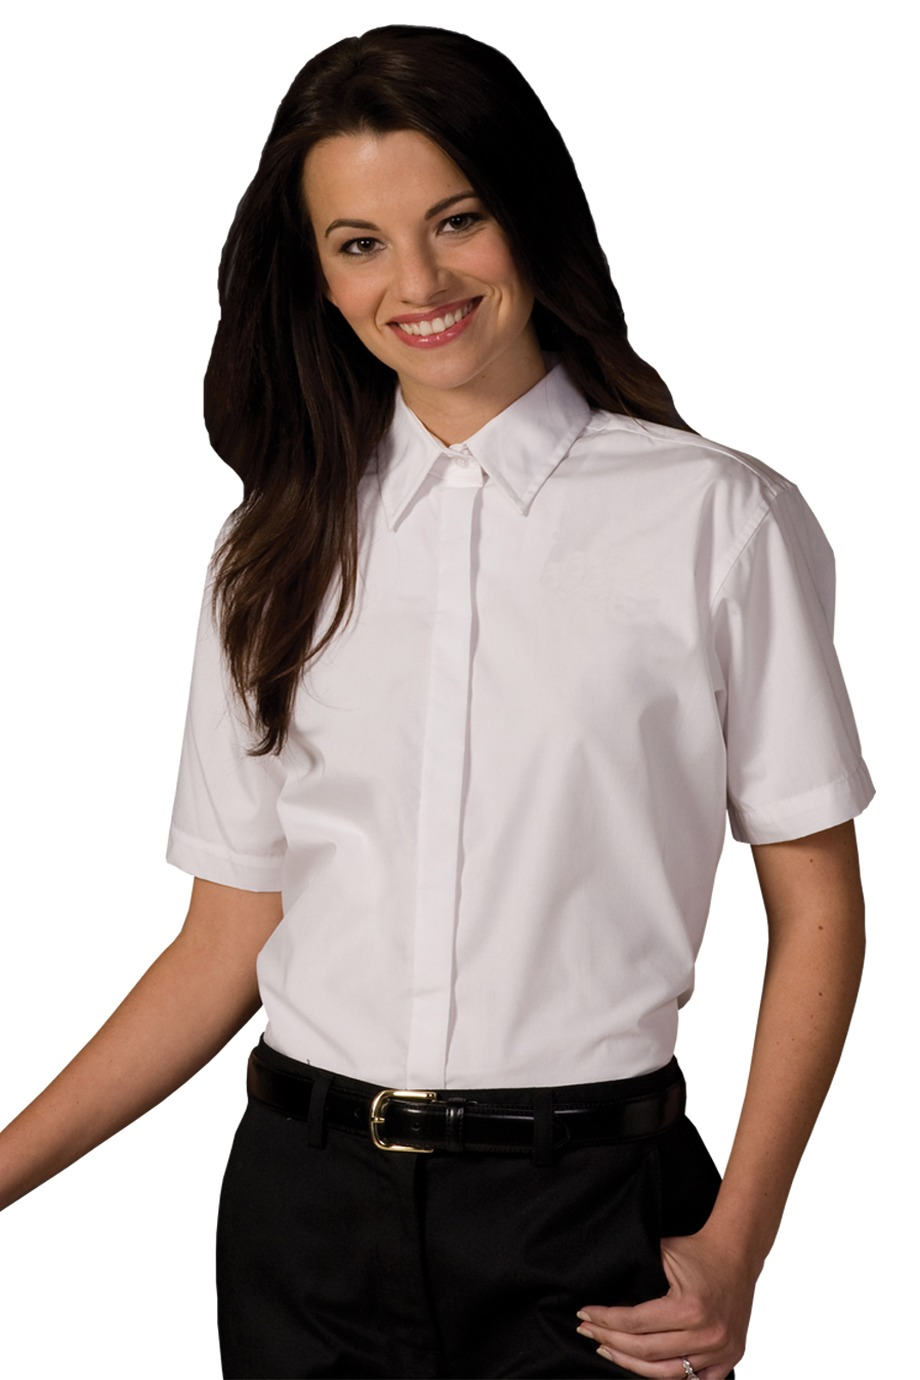 Edwards Garment 5240 女士短袖衬衣T恤